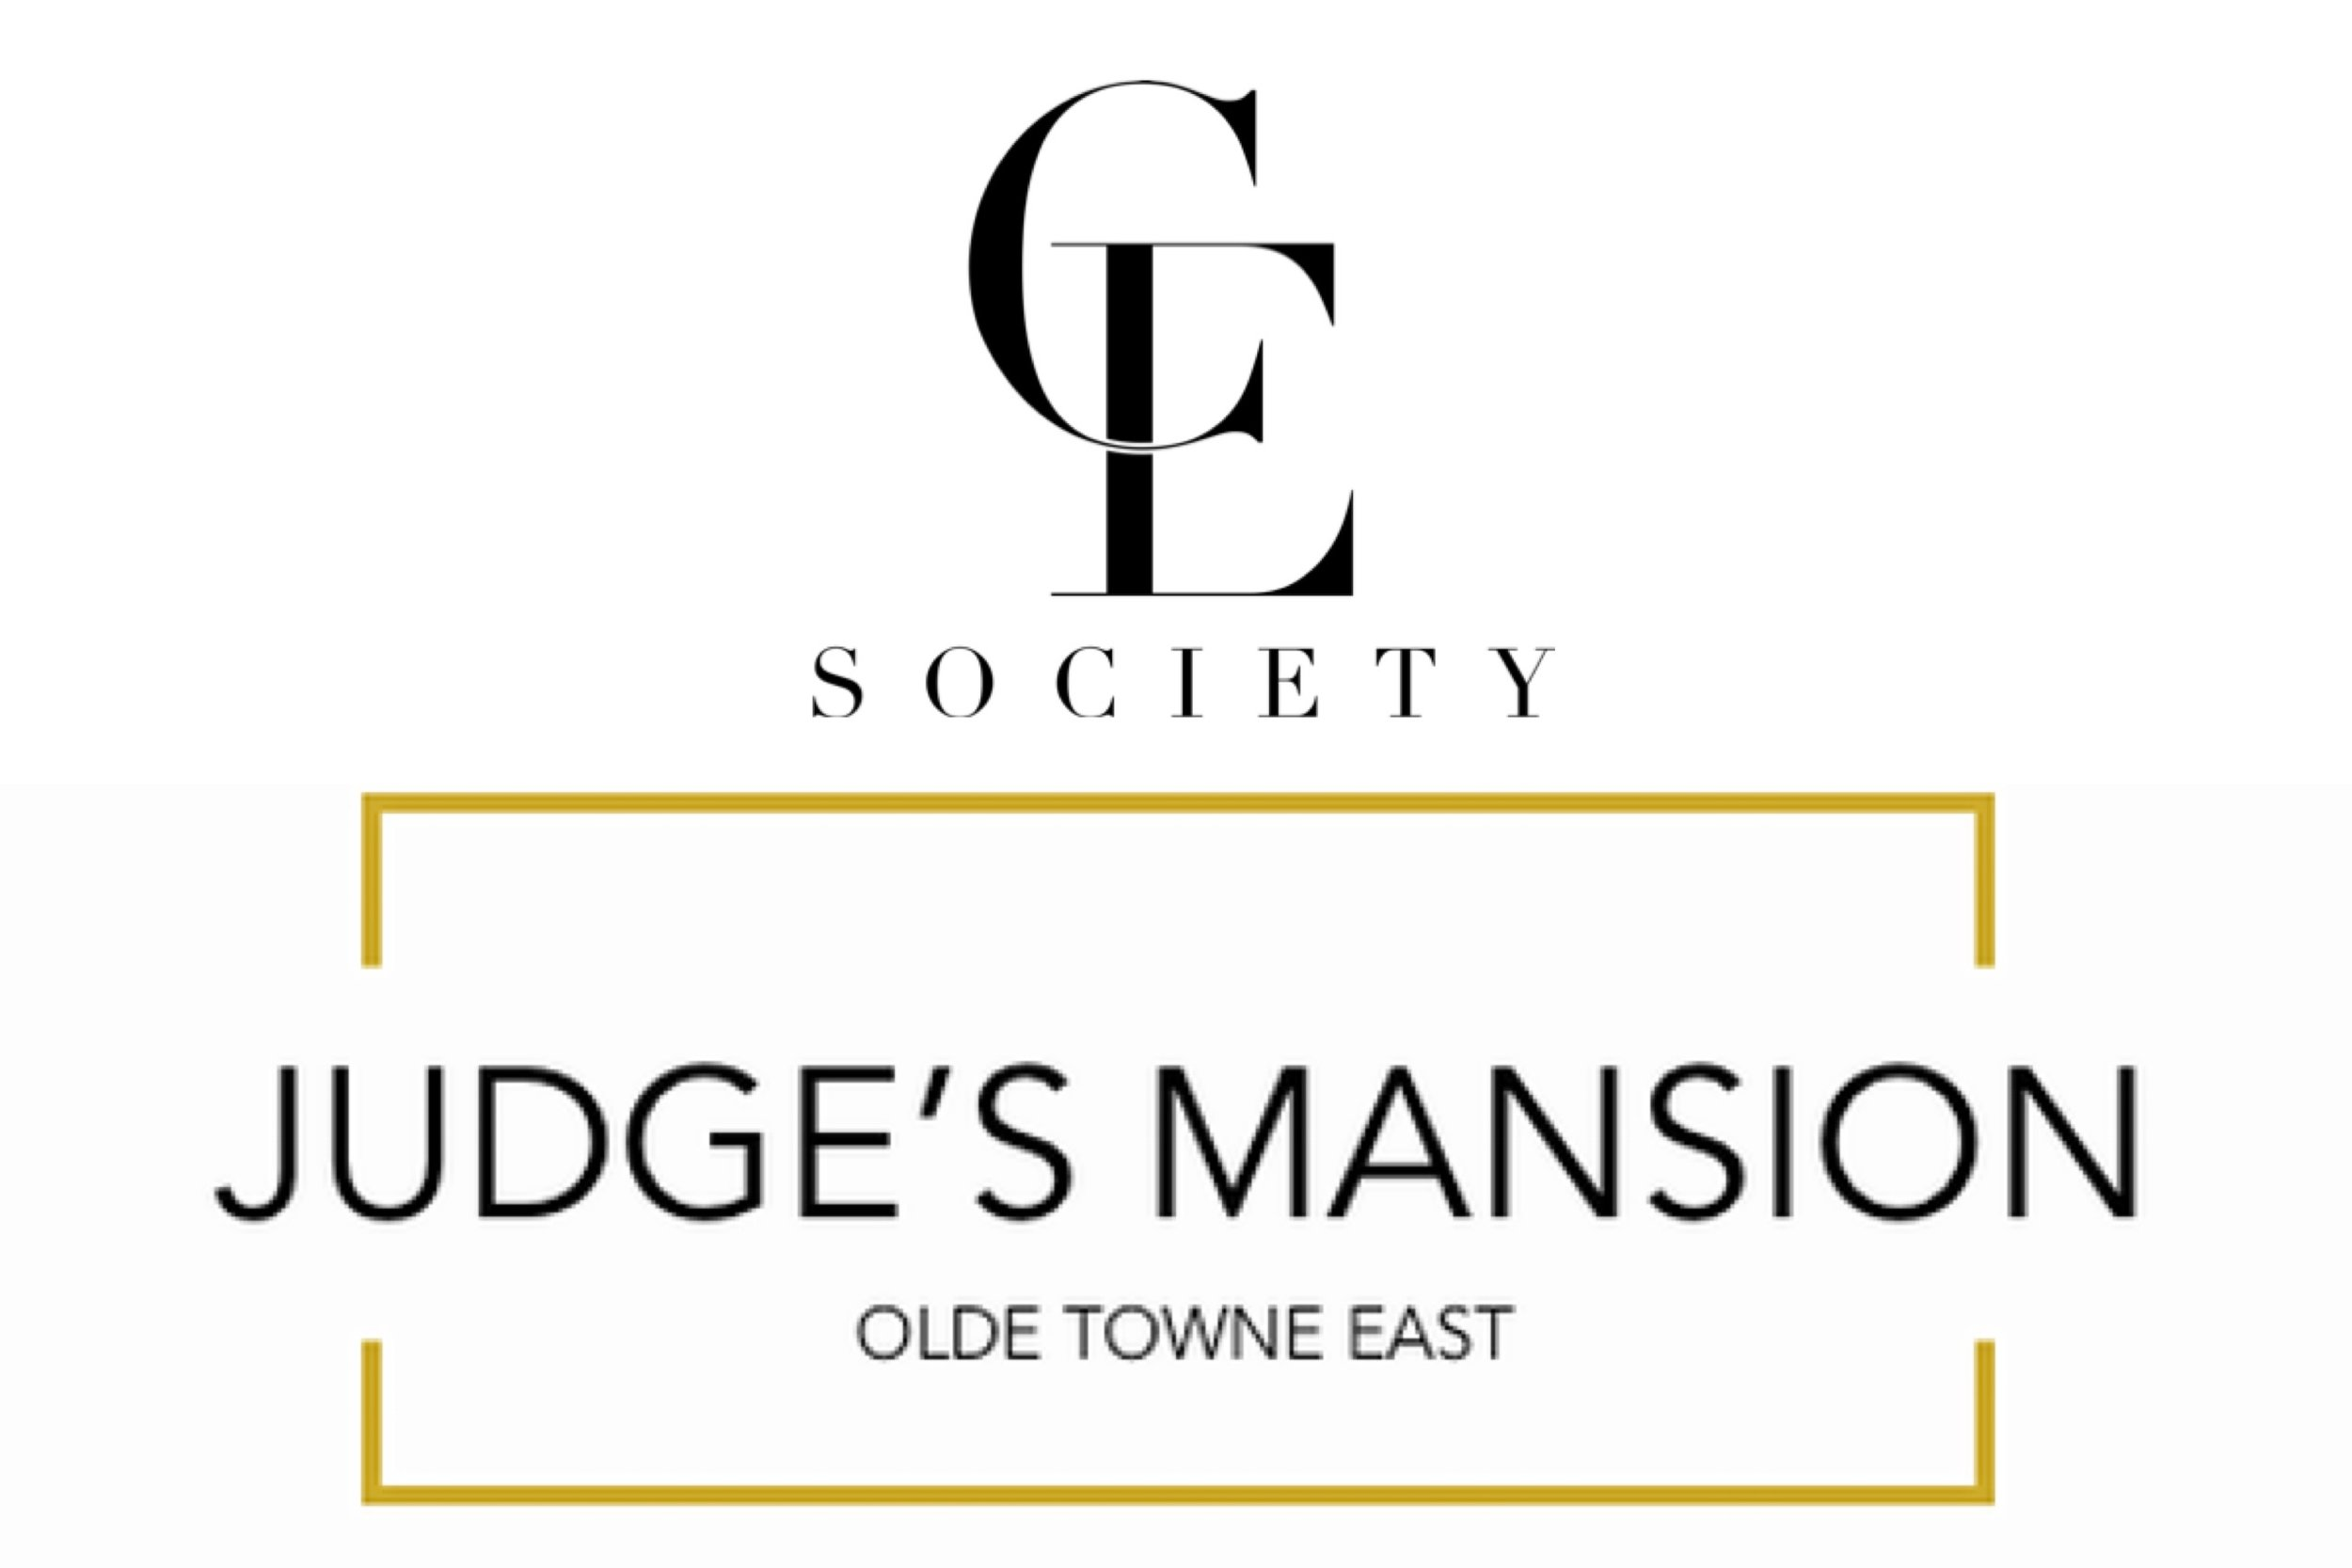 - Photographer: Sumner HowellsModel: Markisha WilderMakeup: Le Luxe Beauty ConciergeVenue: Judges MansionWardrobe: GoldMine BoutiqueAccessories: Store 5a